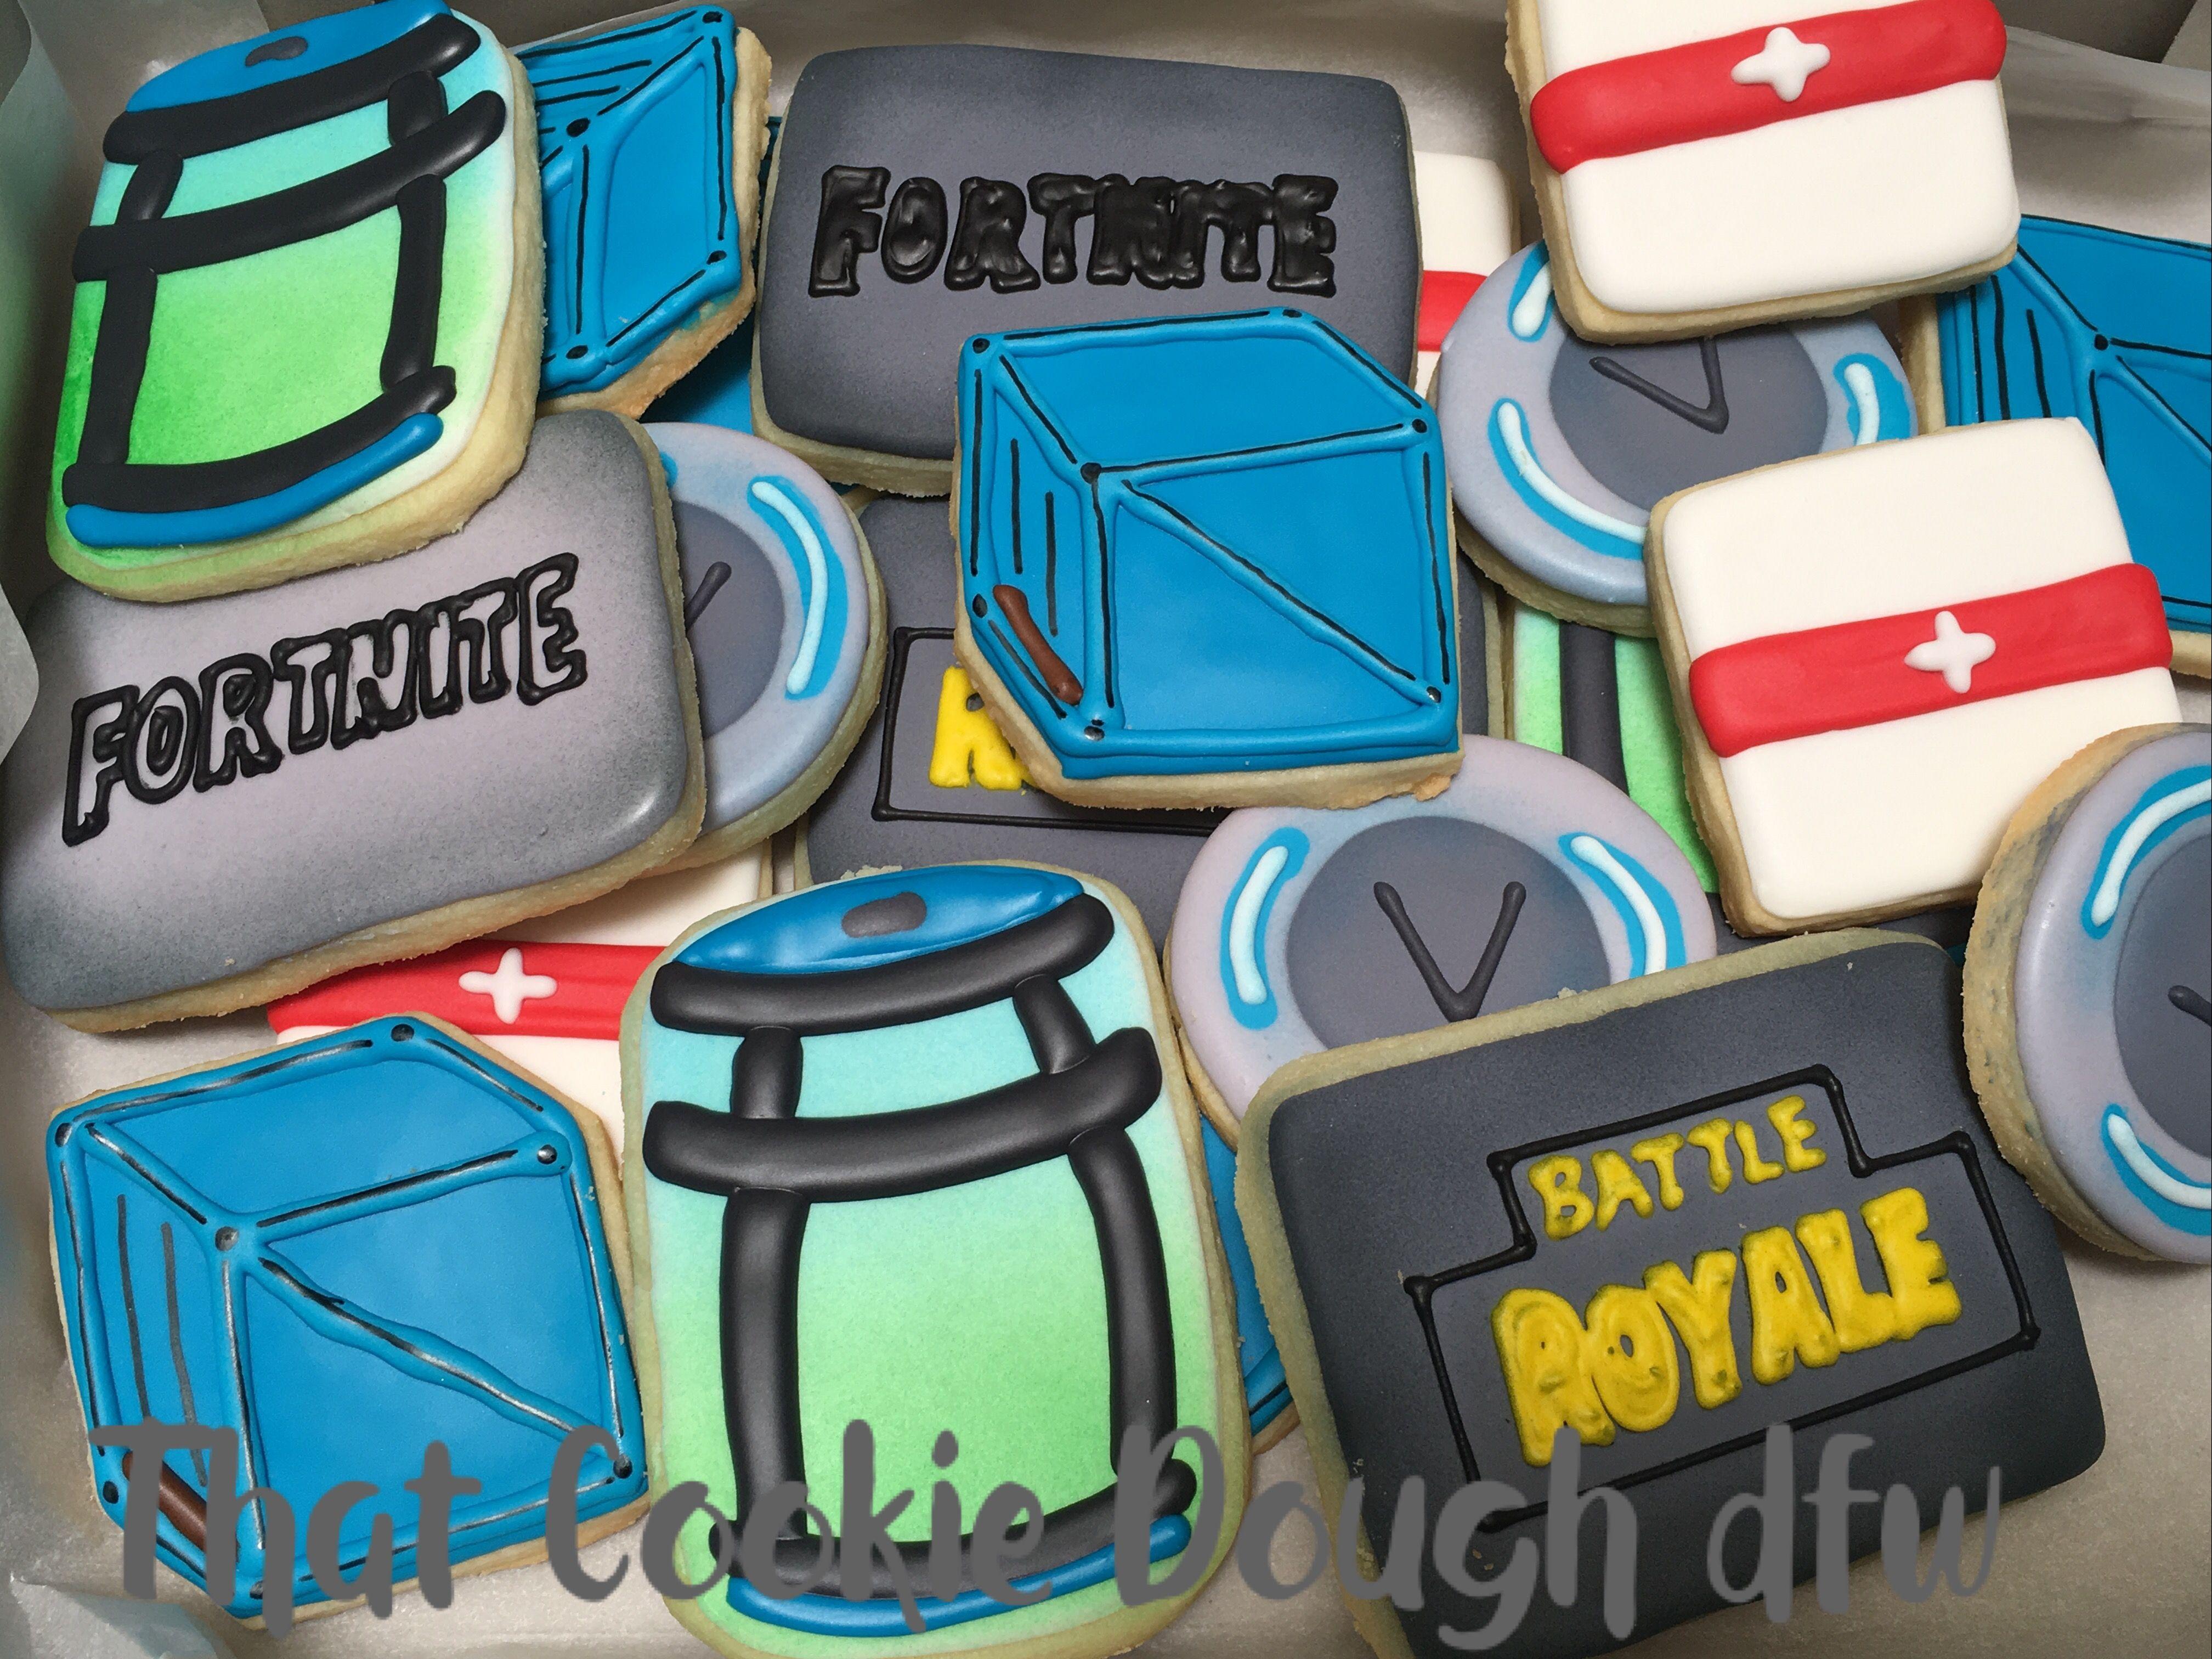 Fortnite cookies birthday cake toppers cookie